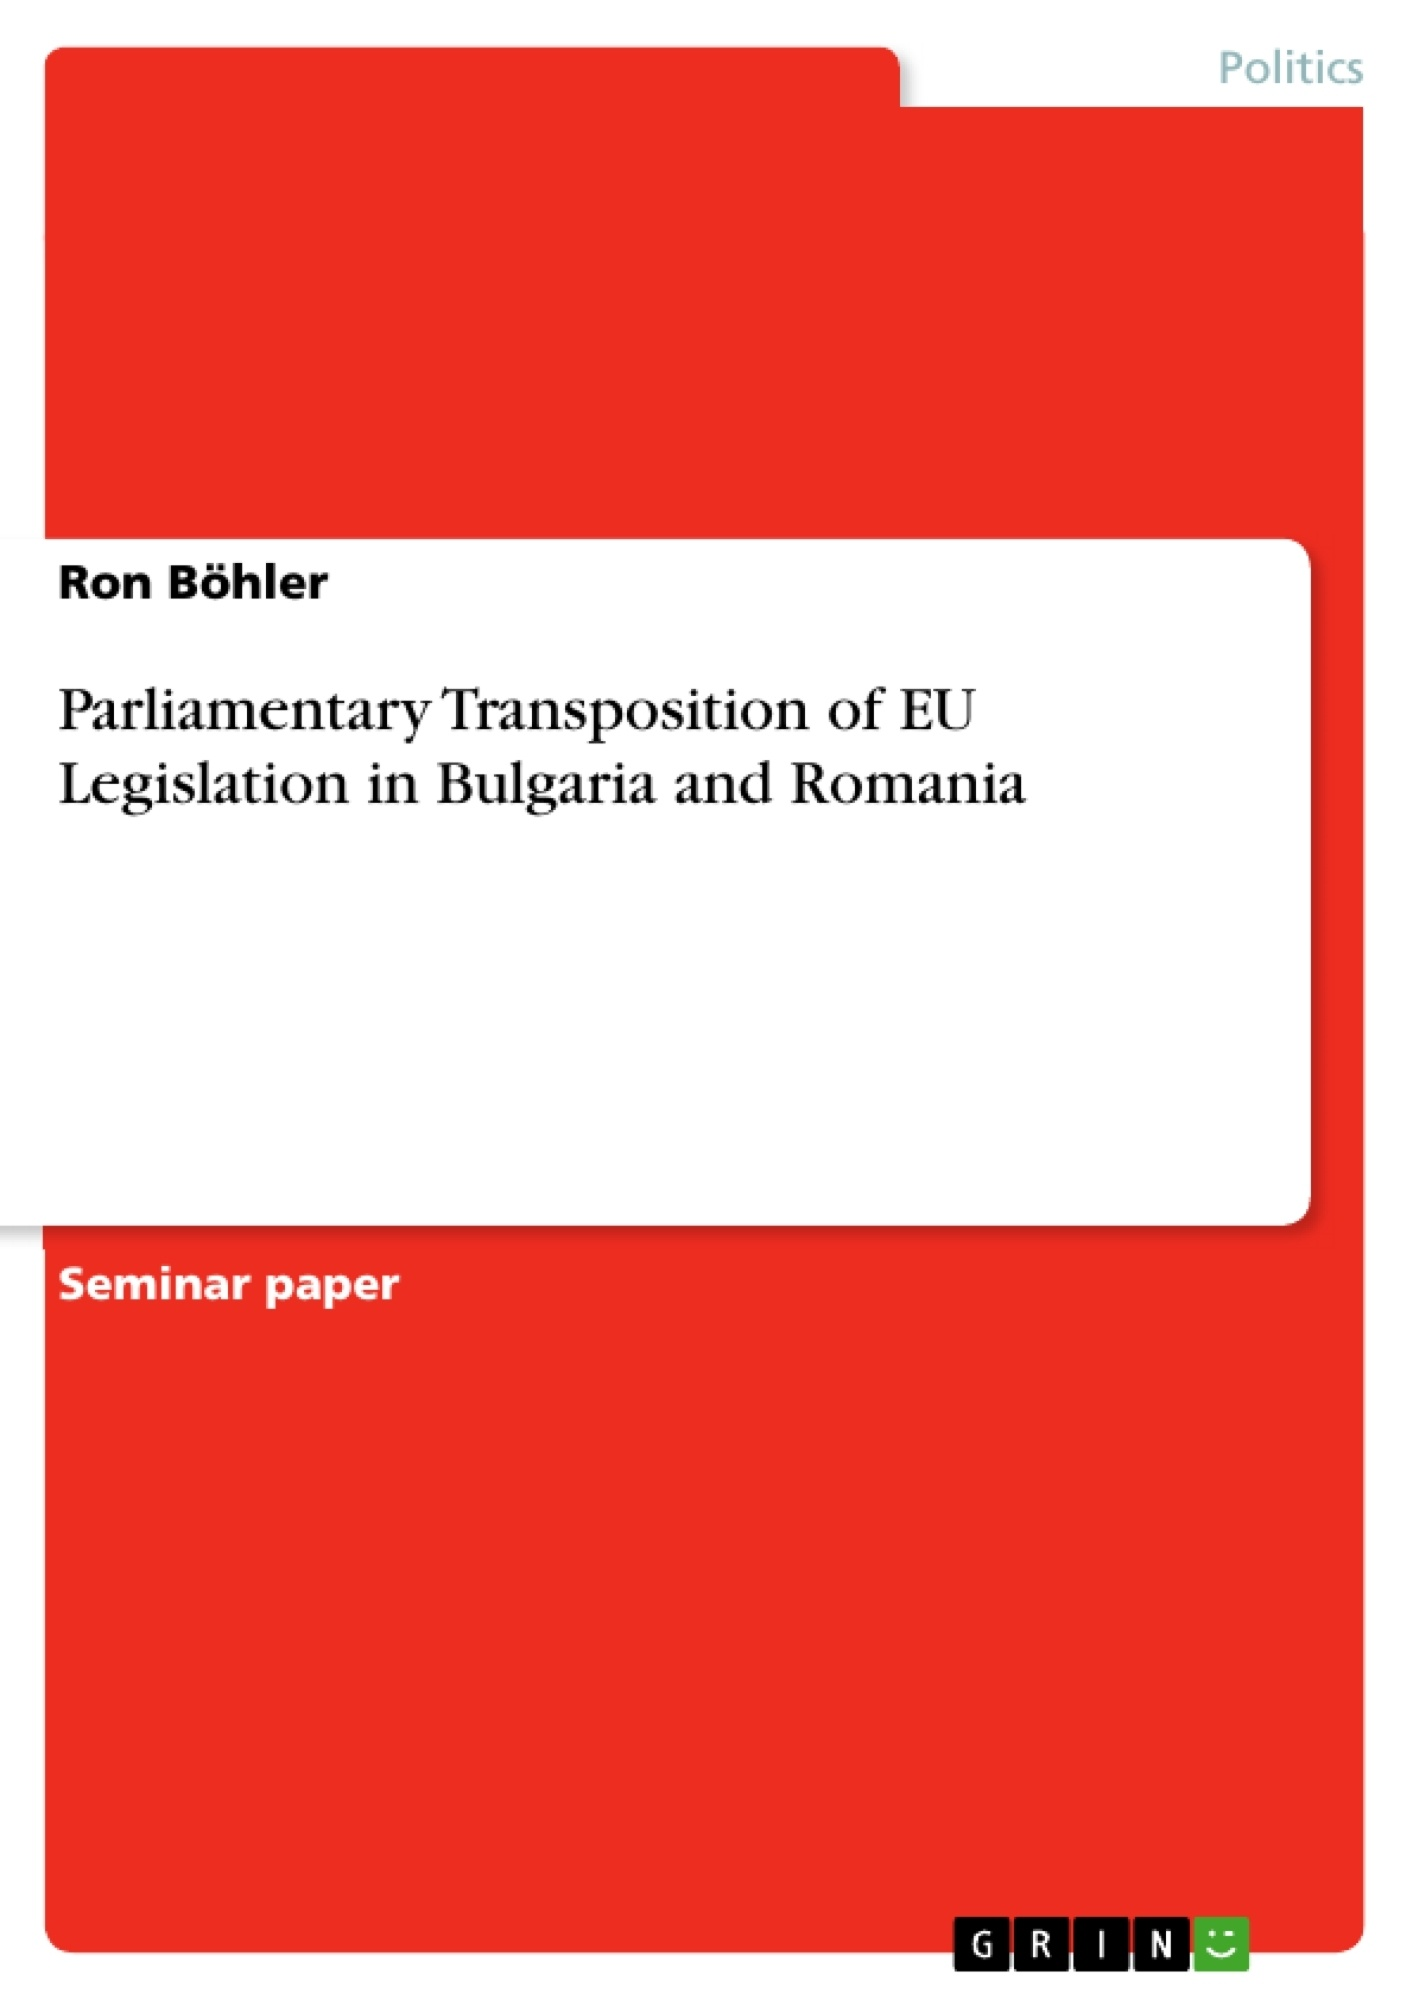 Title: Parliamentary Transposition of EU Legislation in Bulgaria and Romania